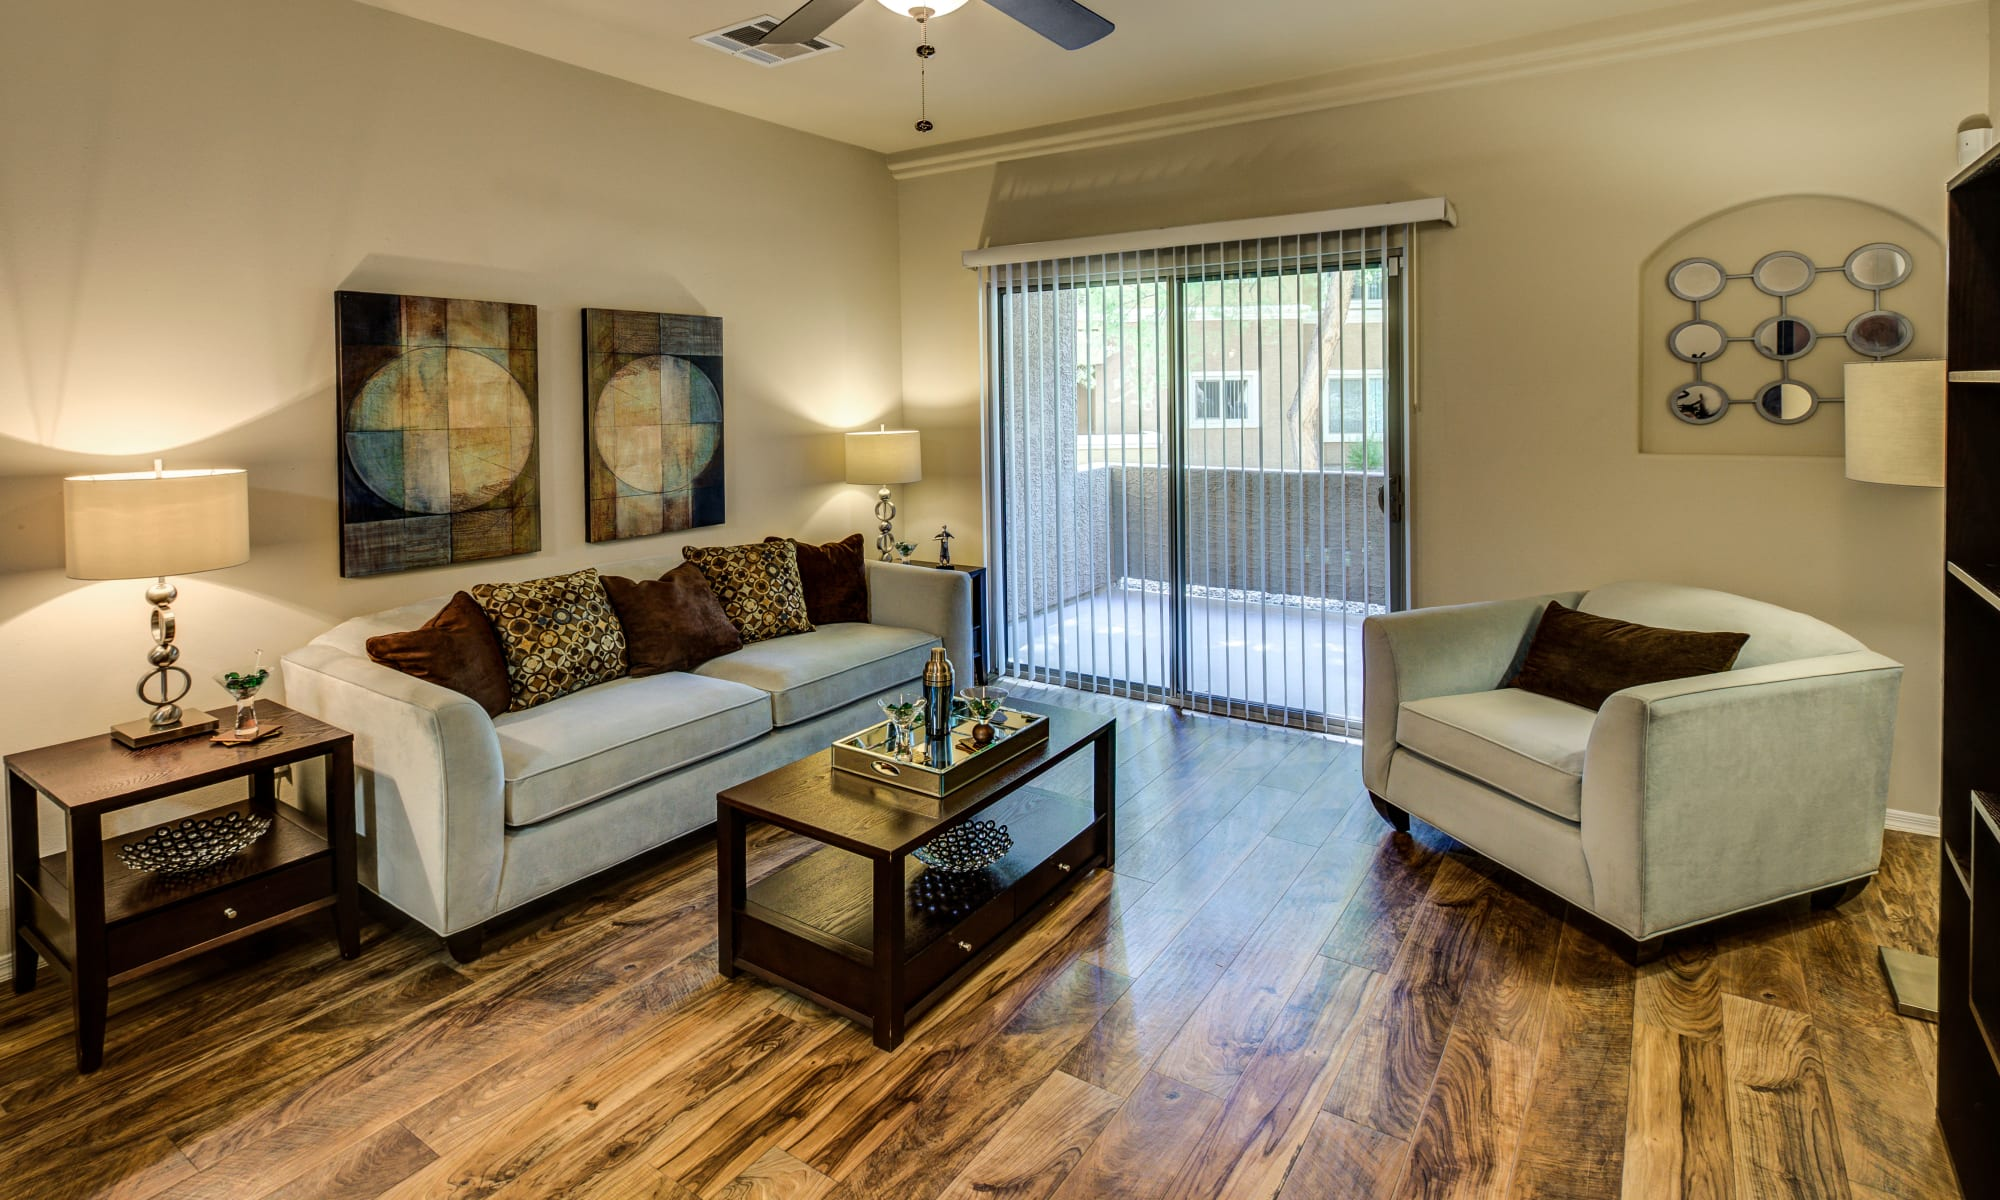 The Regents at Scottsdale apartments in Scottsdale, Arizona